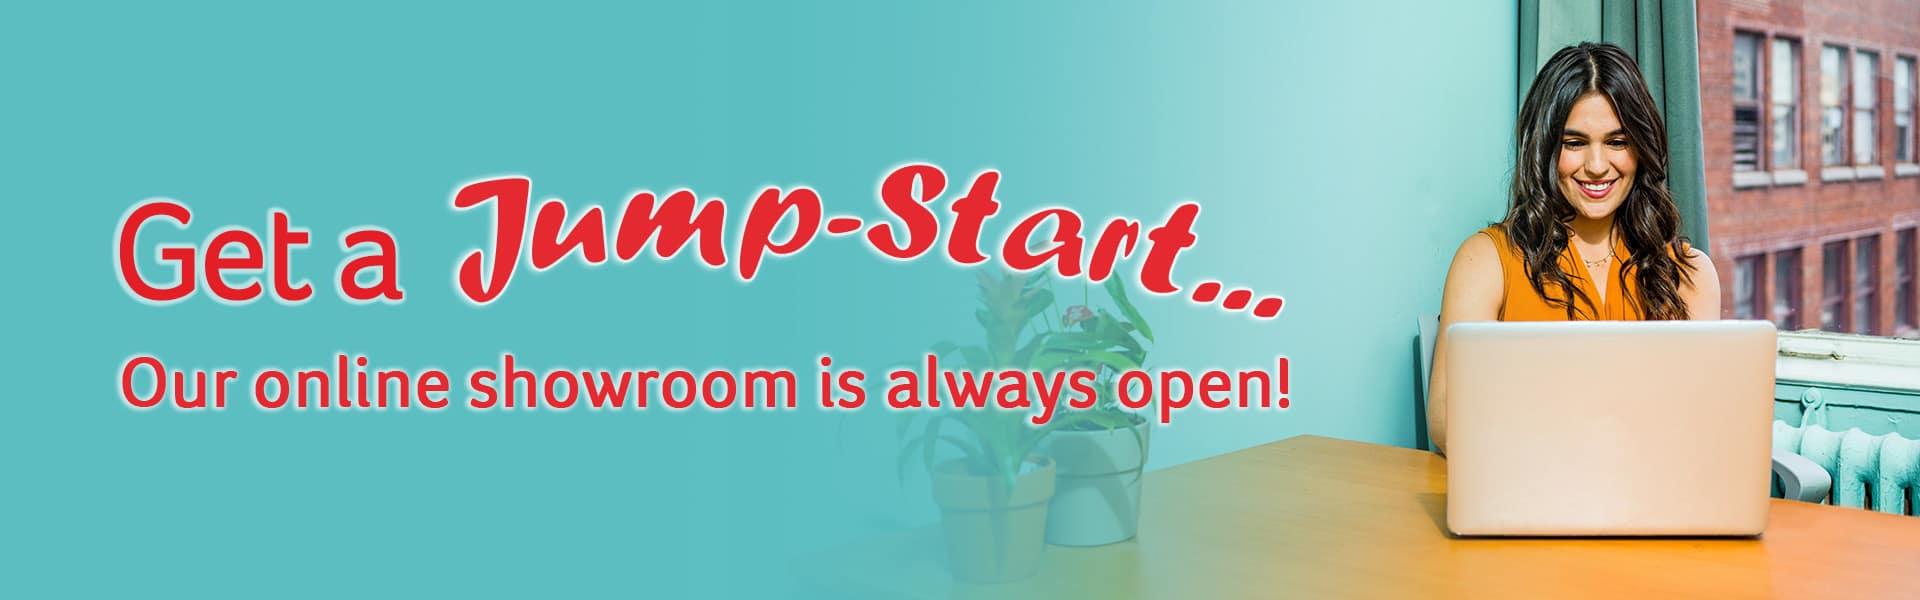 TAF Jump-Start 1920x600 Custom Page Banner 5.21